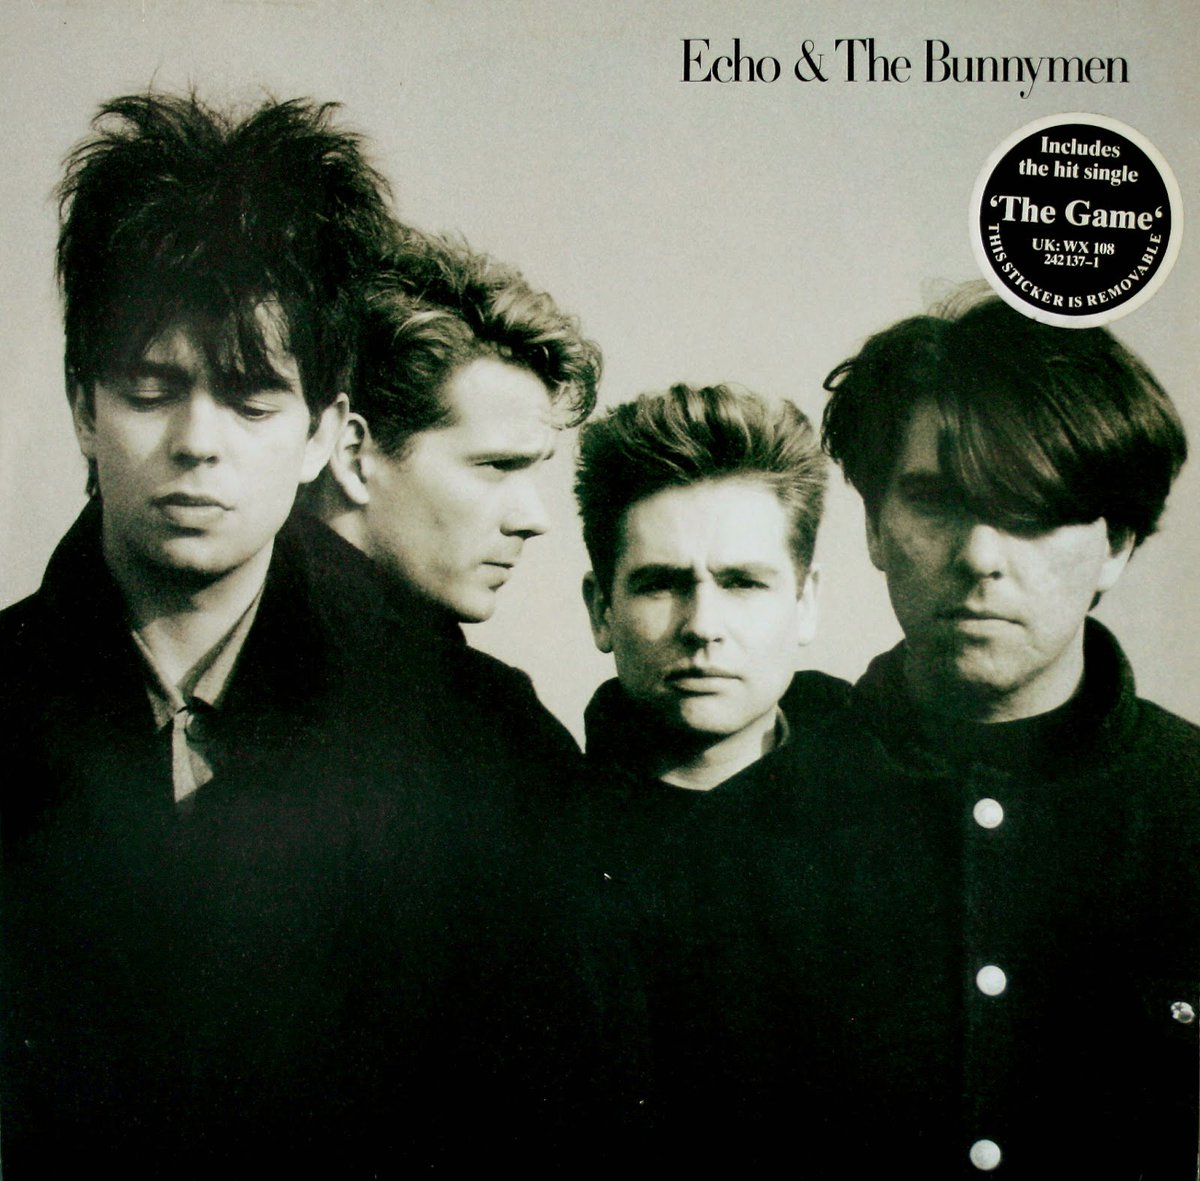 Voici 30 ans dans BEST, GBD faisait tout le jeu des hommes-lapins d'Echo and the Bunnymen ;) #EchoandtheBunnymen #BEST #nostalgia #rock #Liverpool  https:// gonzomusic.fr/echo-and-the-b unnymen-the-game.html  … pic.twitter.com/AxbWogIl6o